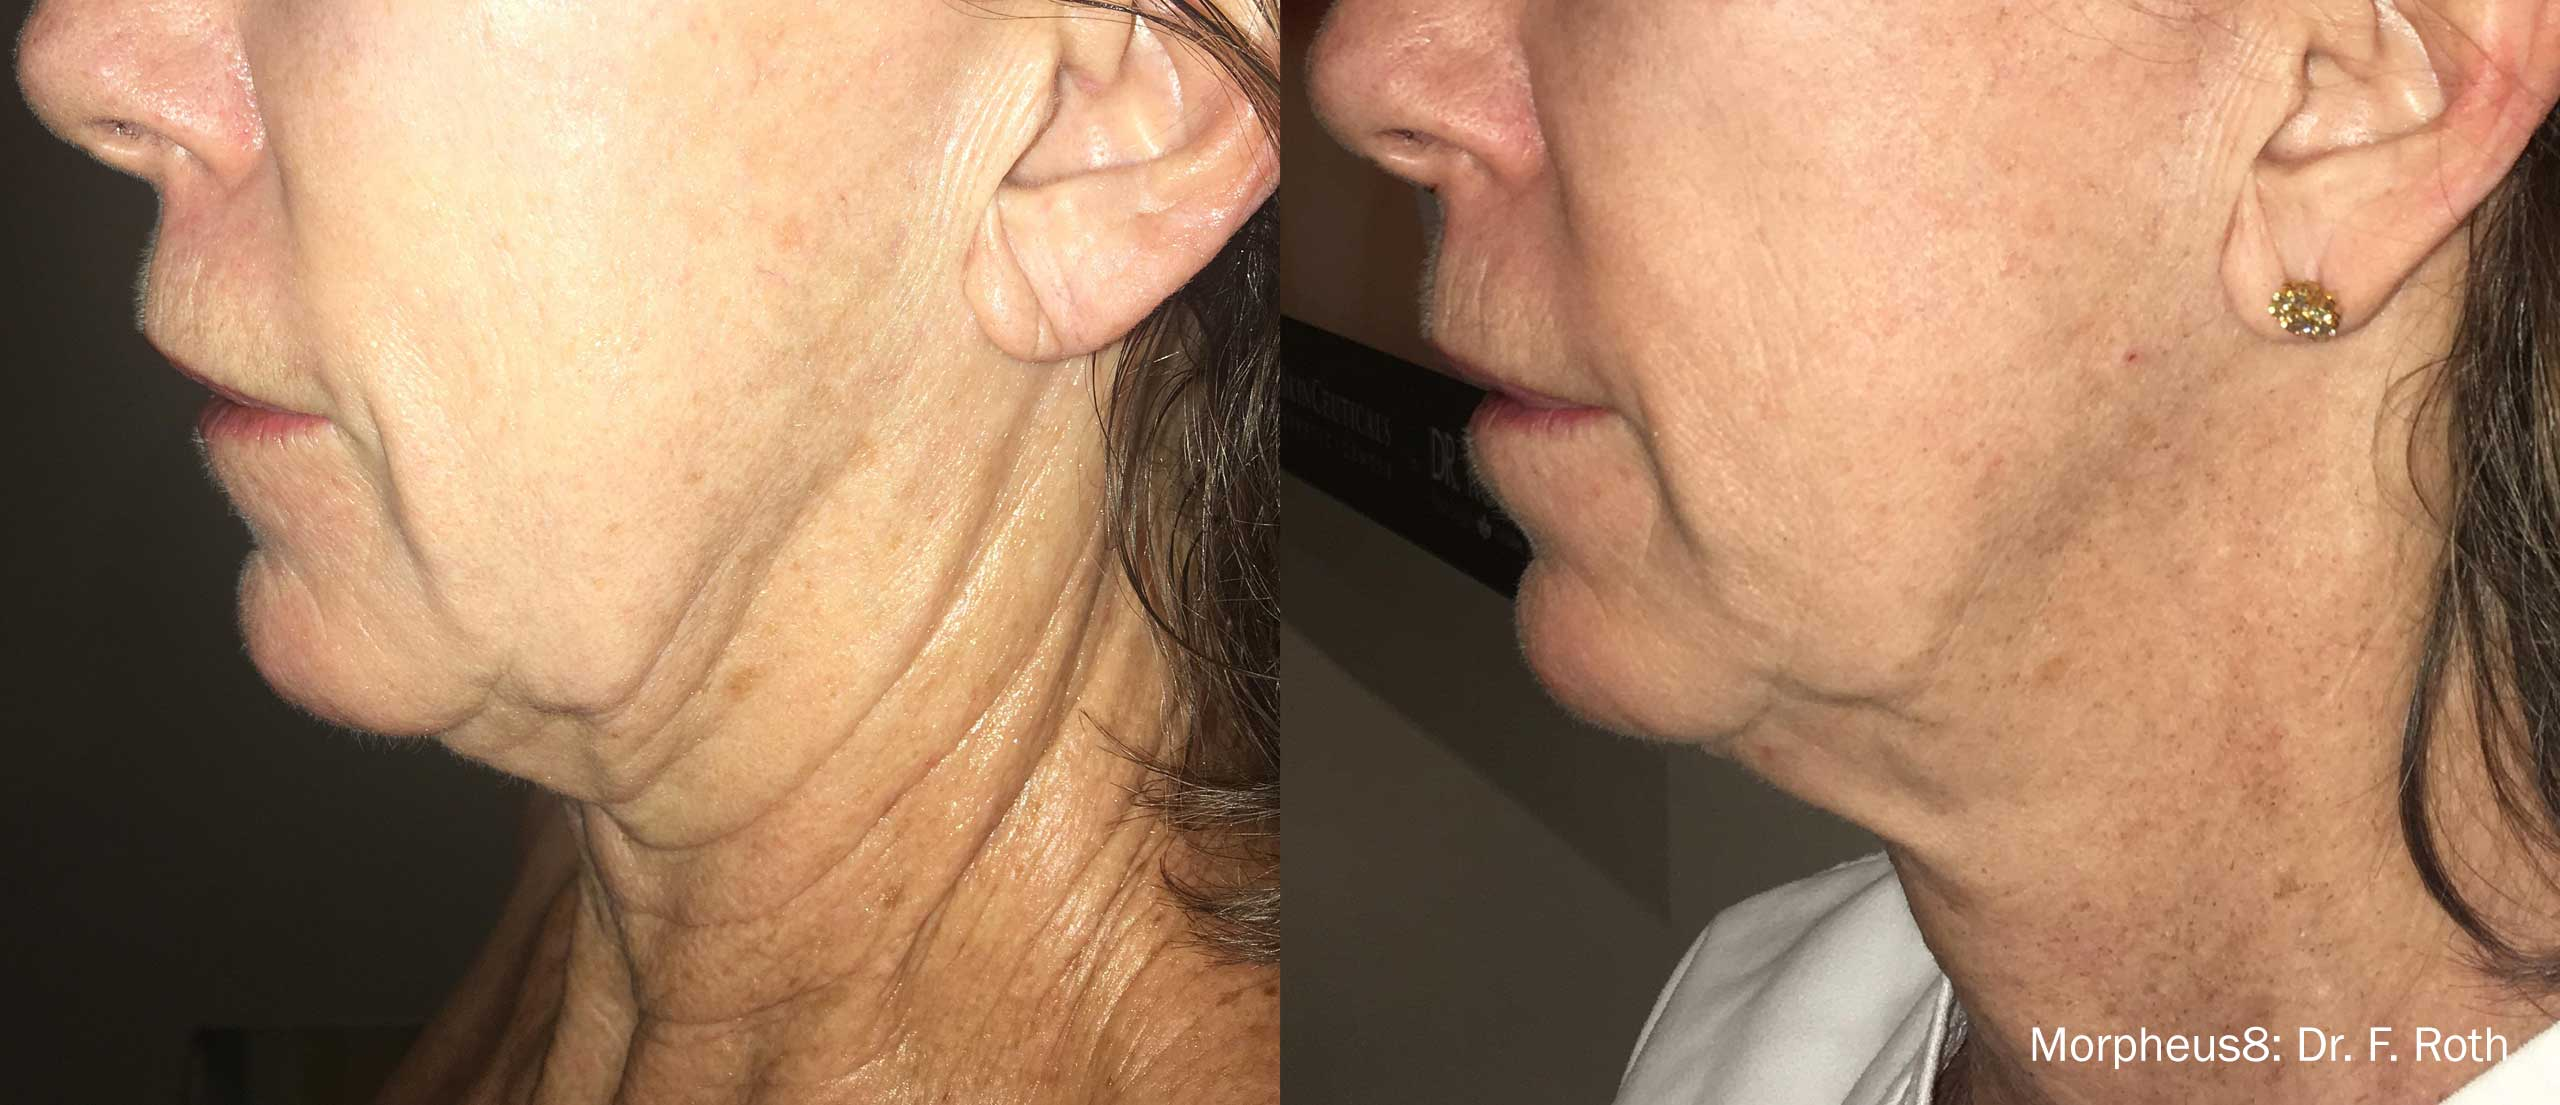 skin rejuvenation treatment results in Millburn, NJ